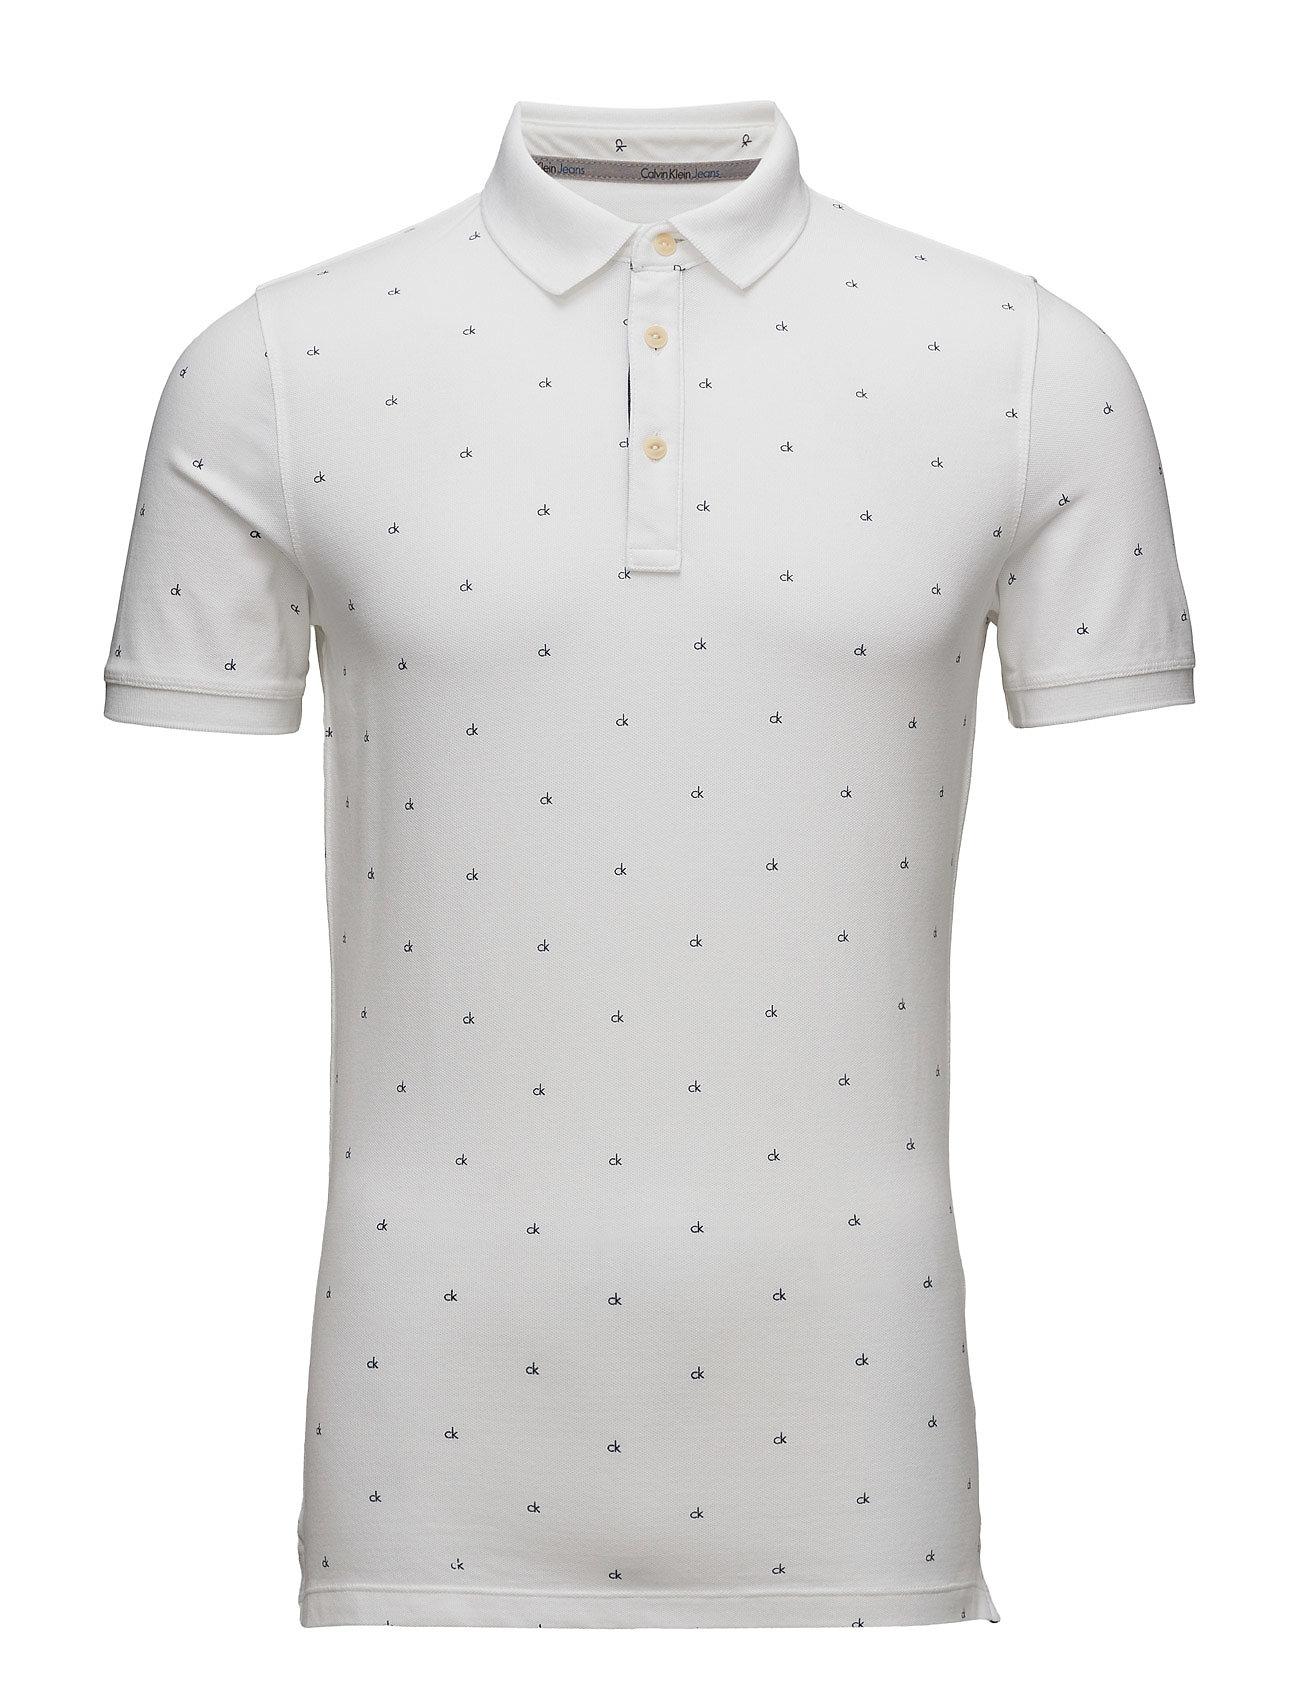 Pertol 3 Slim Fit Po Calvin Klein Jeans Kortærmede polo t-shirts til Herrer i Bright White